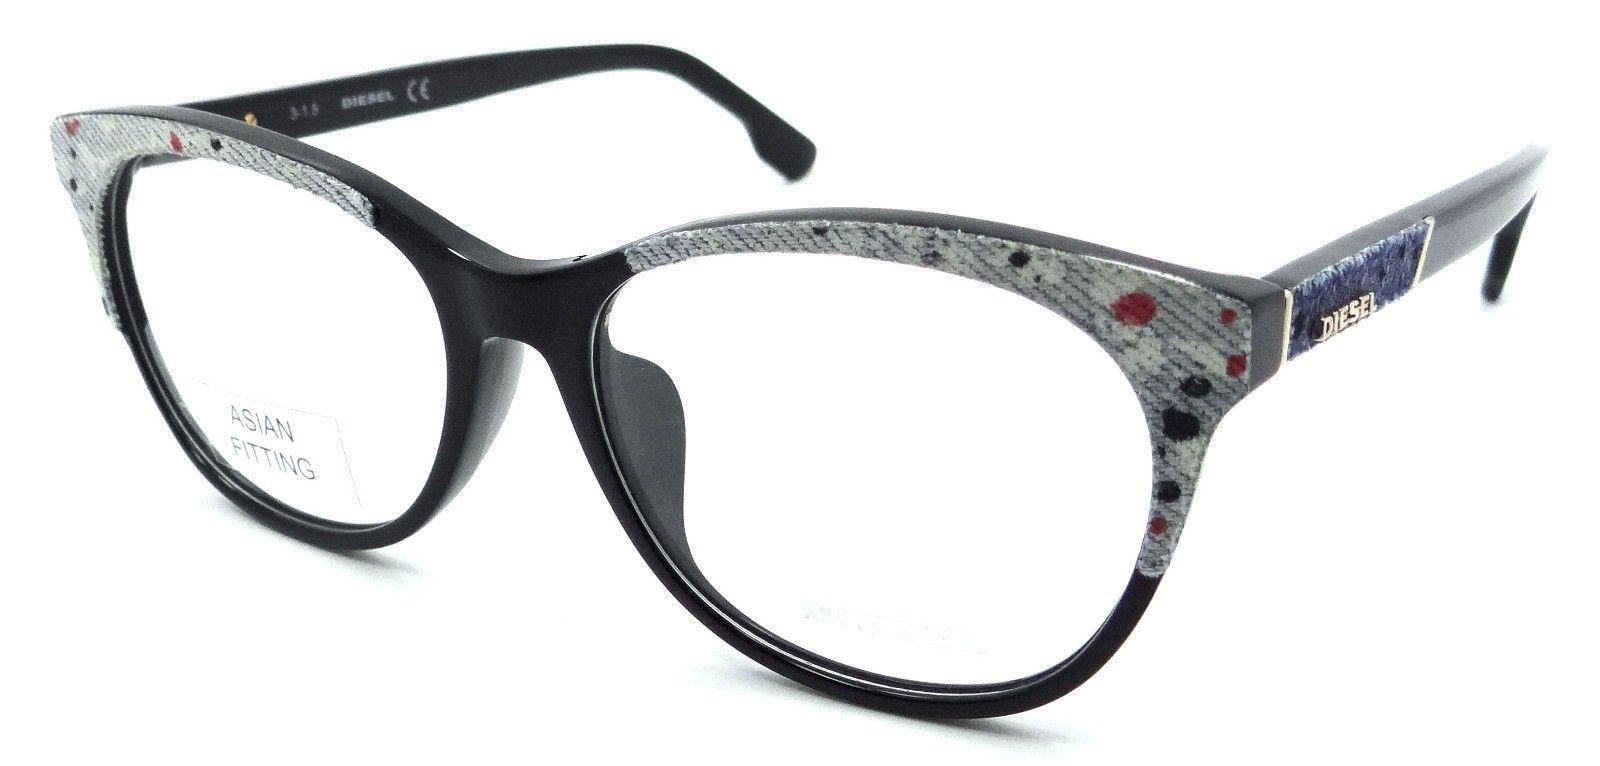 d1c9955091f0 Diesel Rx Eyeglasses Frames DL5155-F 005 and 50 similar items. 57